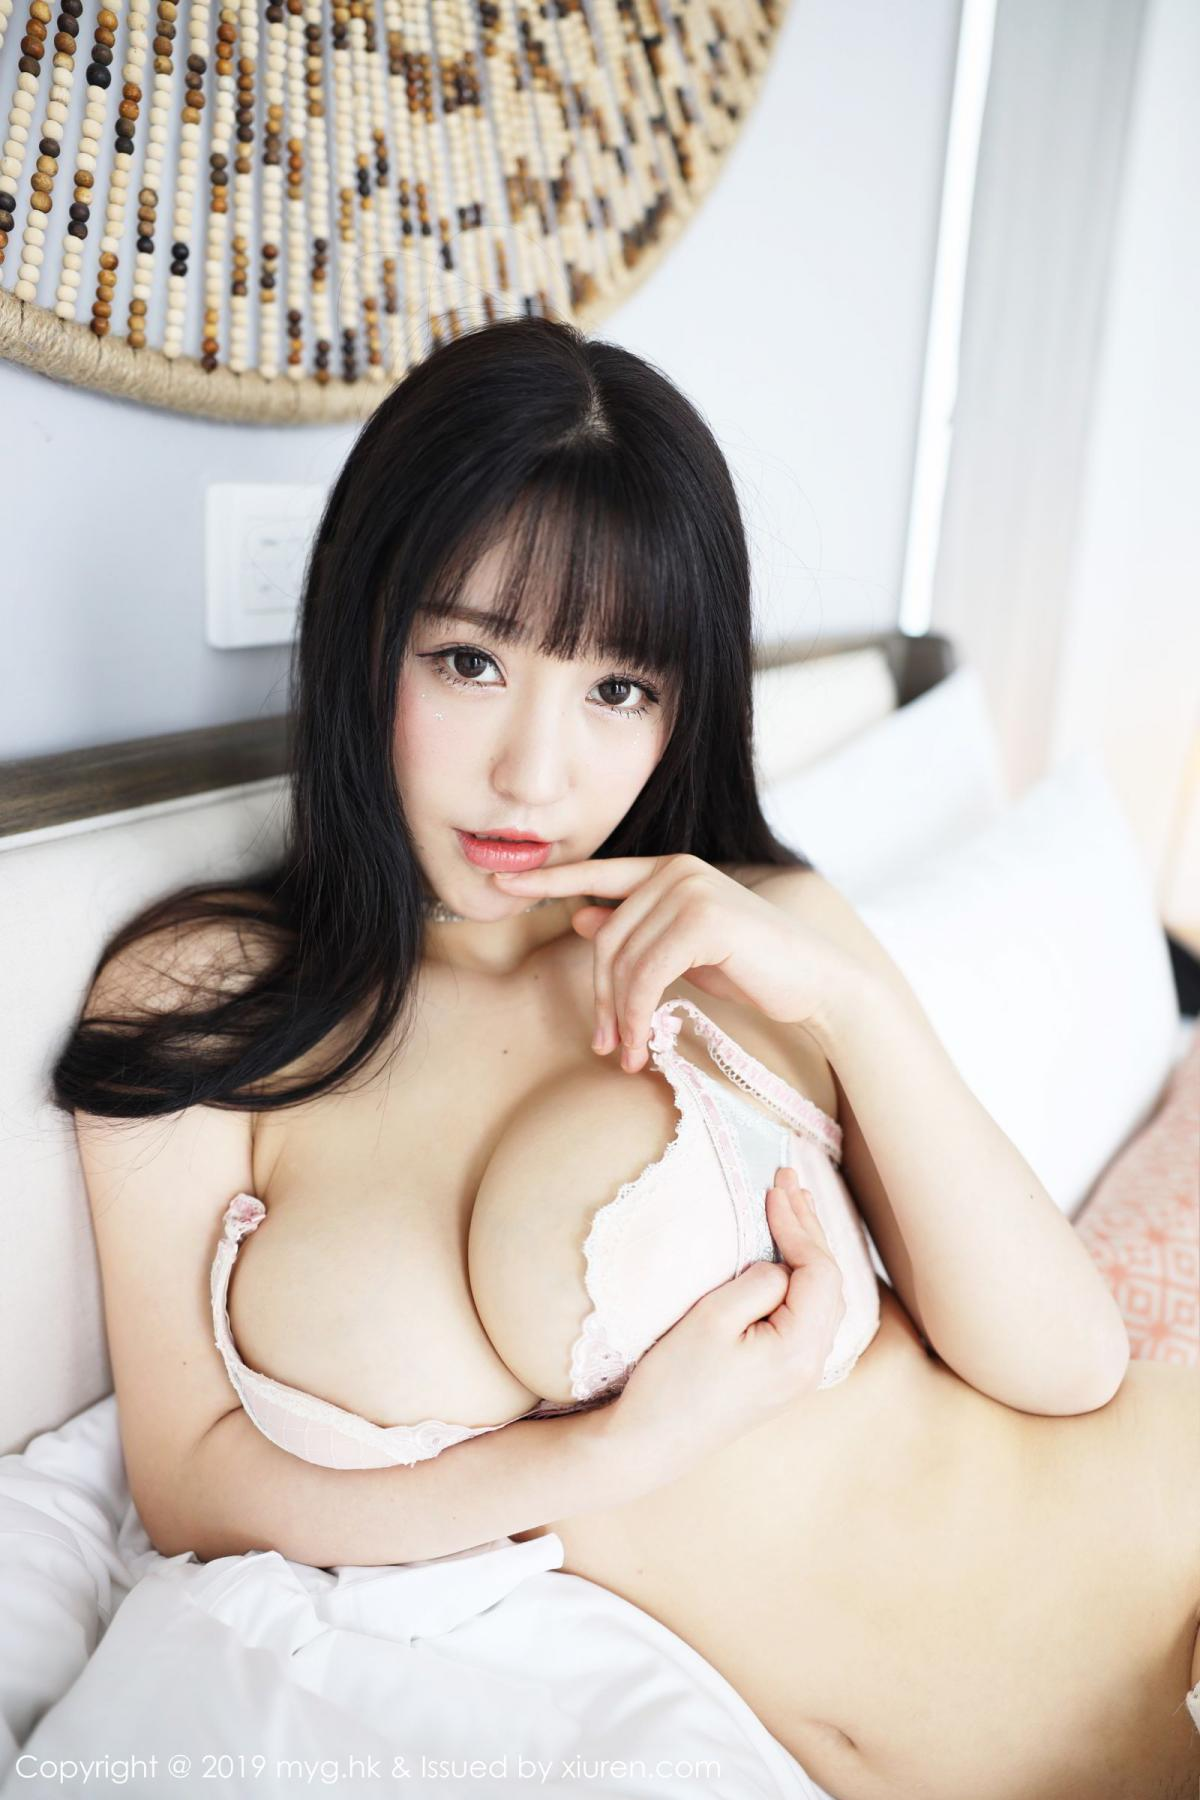 [MyGirl] Vol.364 Zhu Ke Er 45P, mygirl, Underwear, Zhu Ke Er